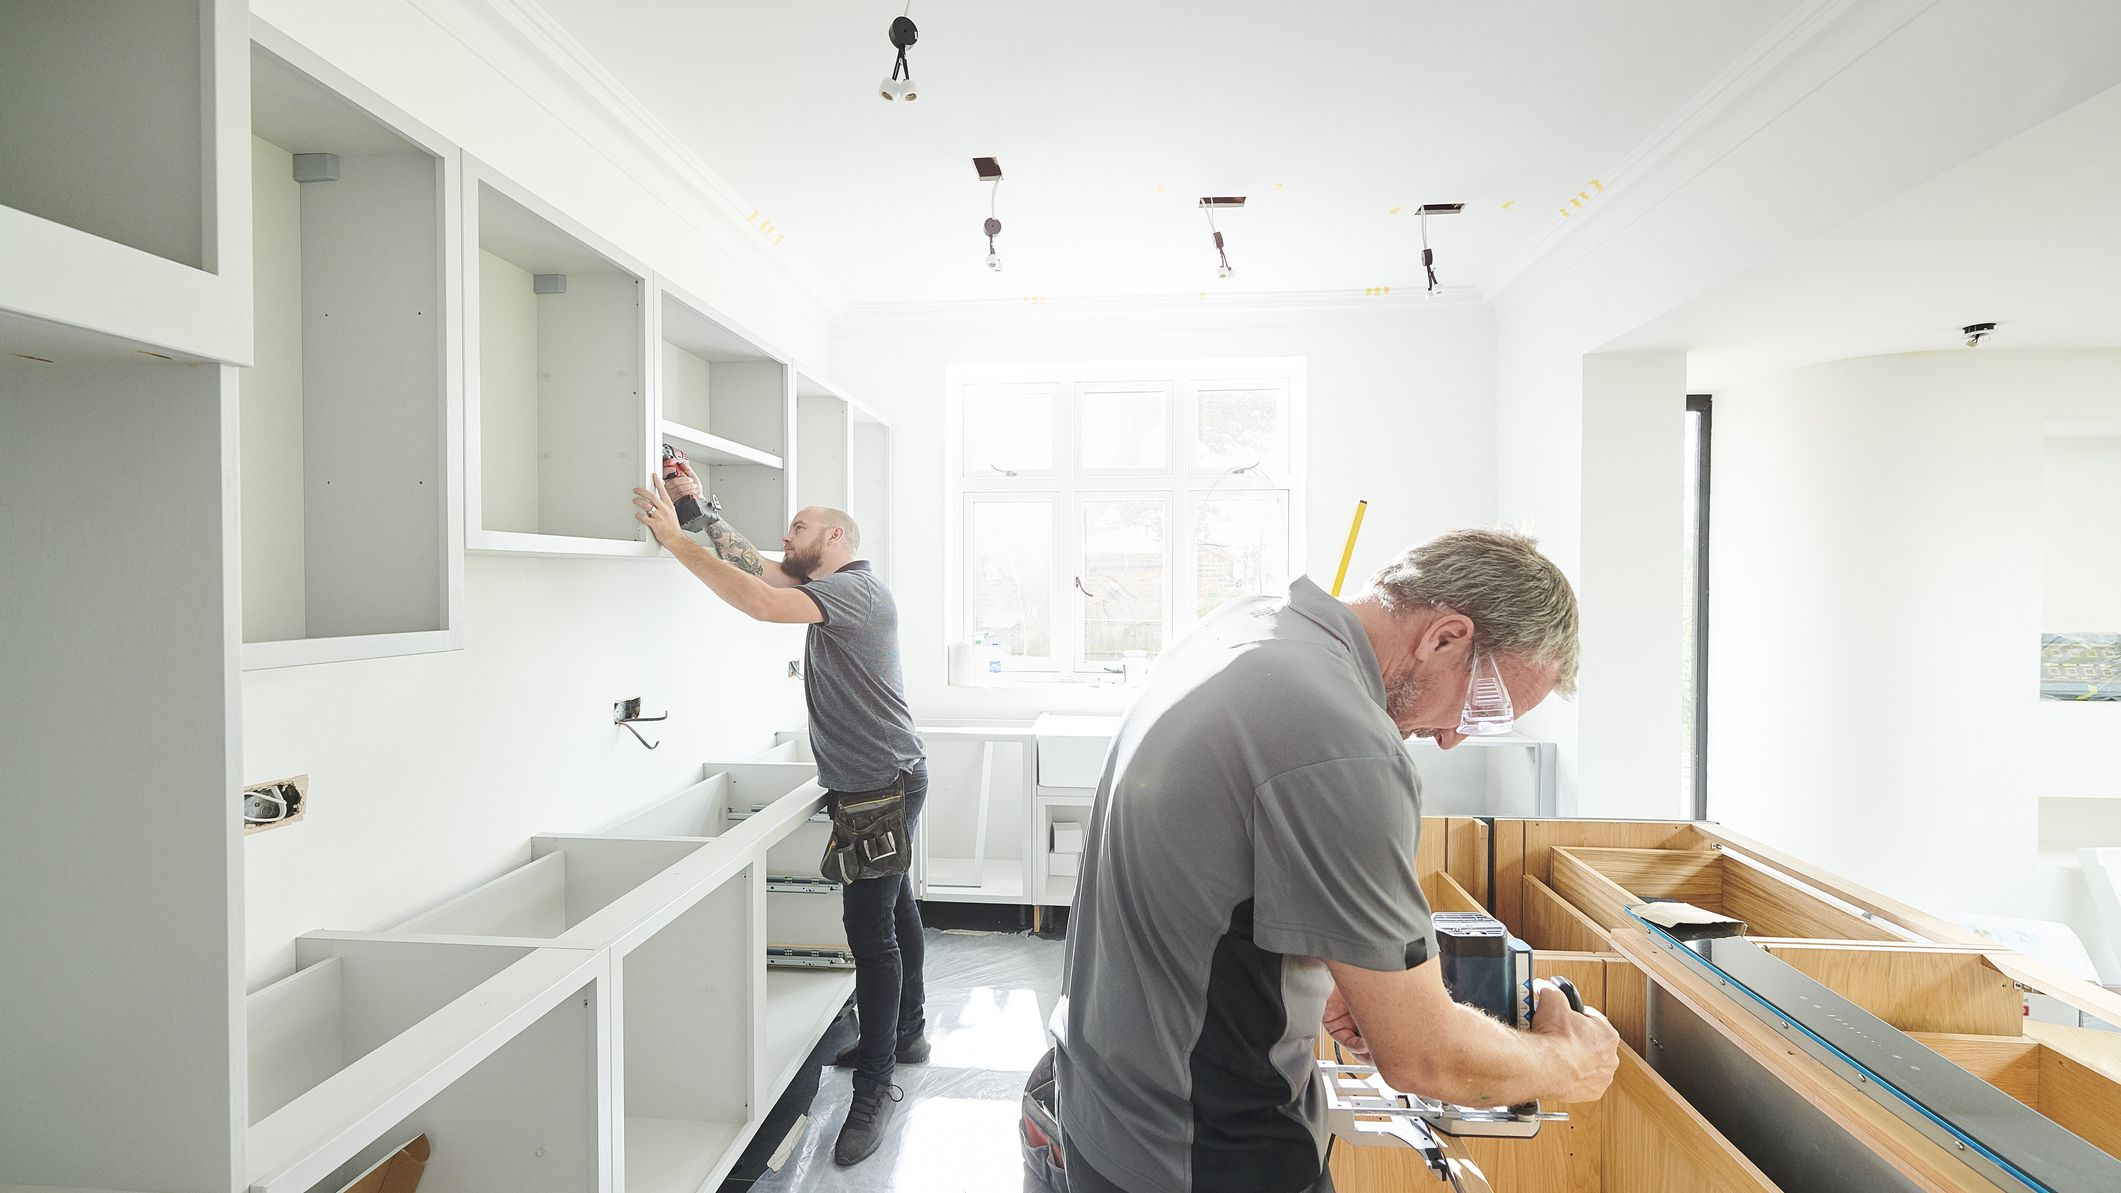 Counter Depth Refrigerator Dimensions